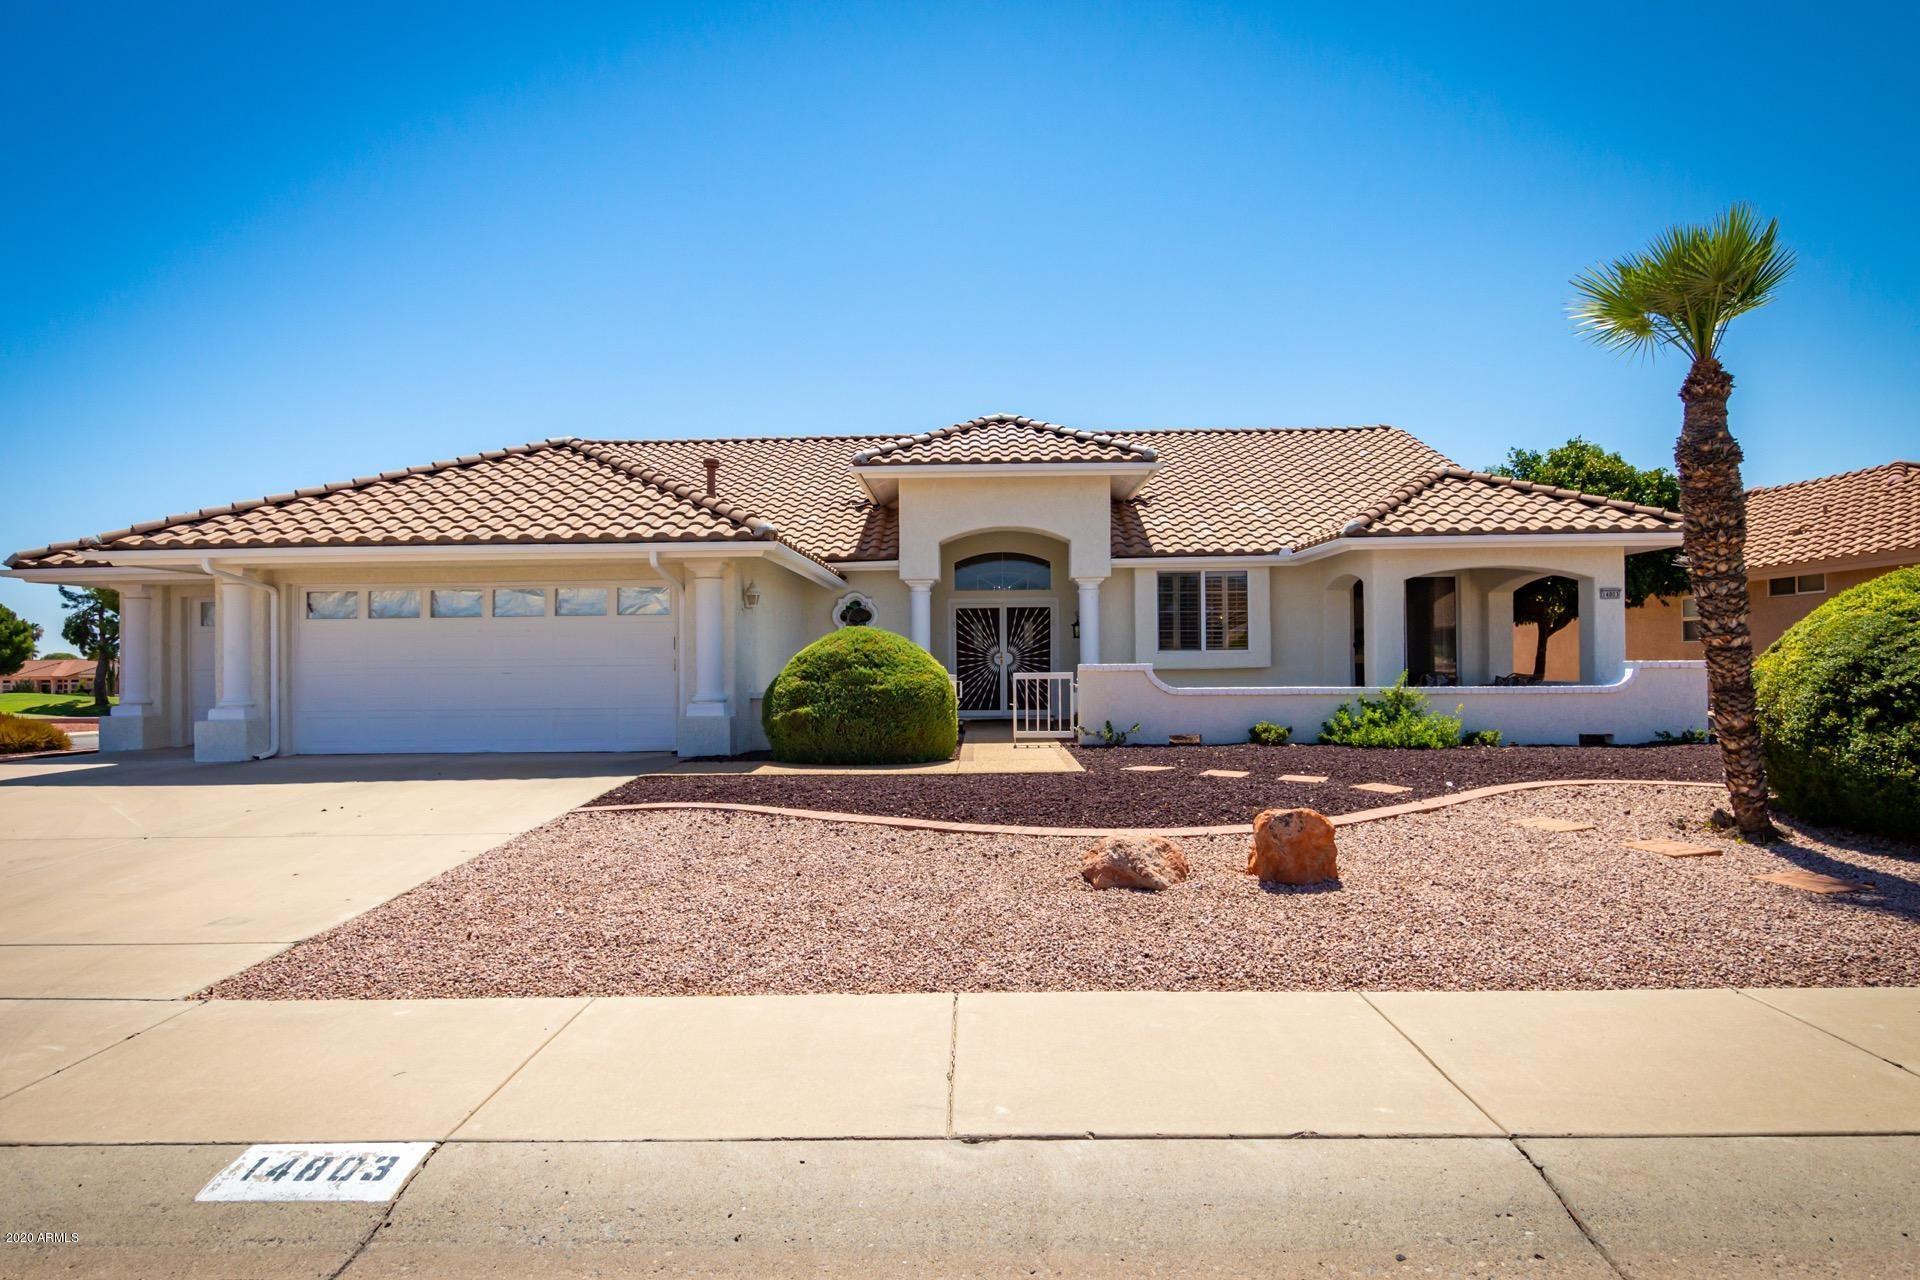 14803 W RAVENSWOOD Drive, Sun City West, AZ 85375 - MLS#: 6127928